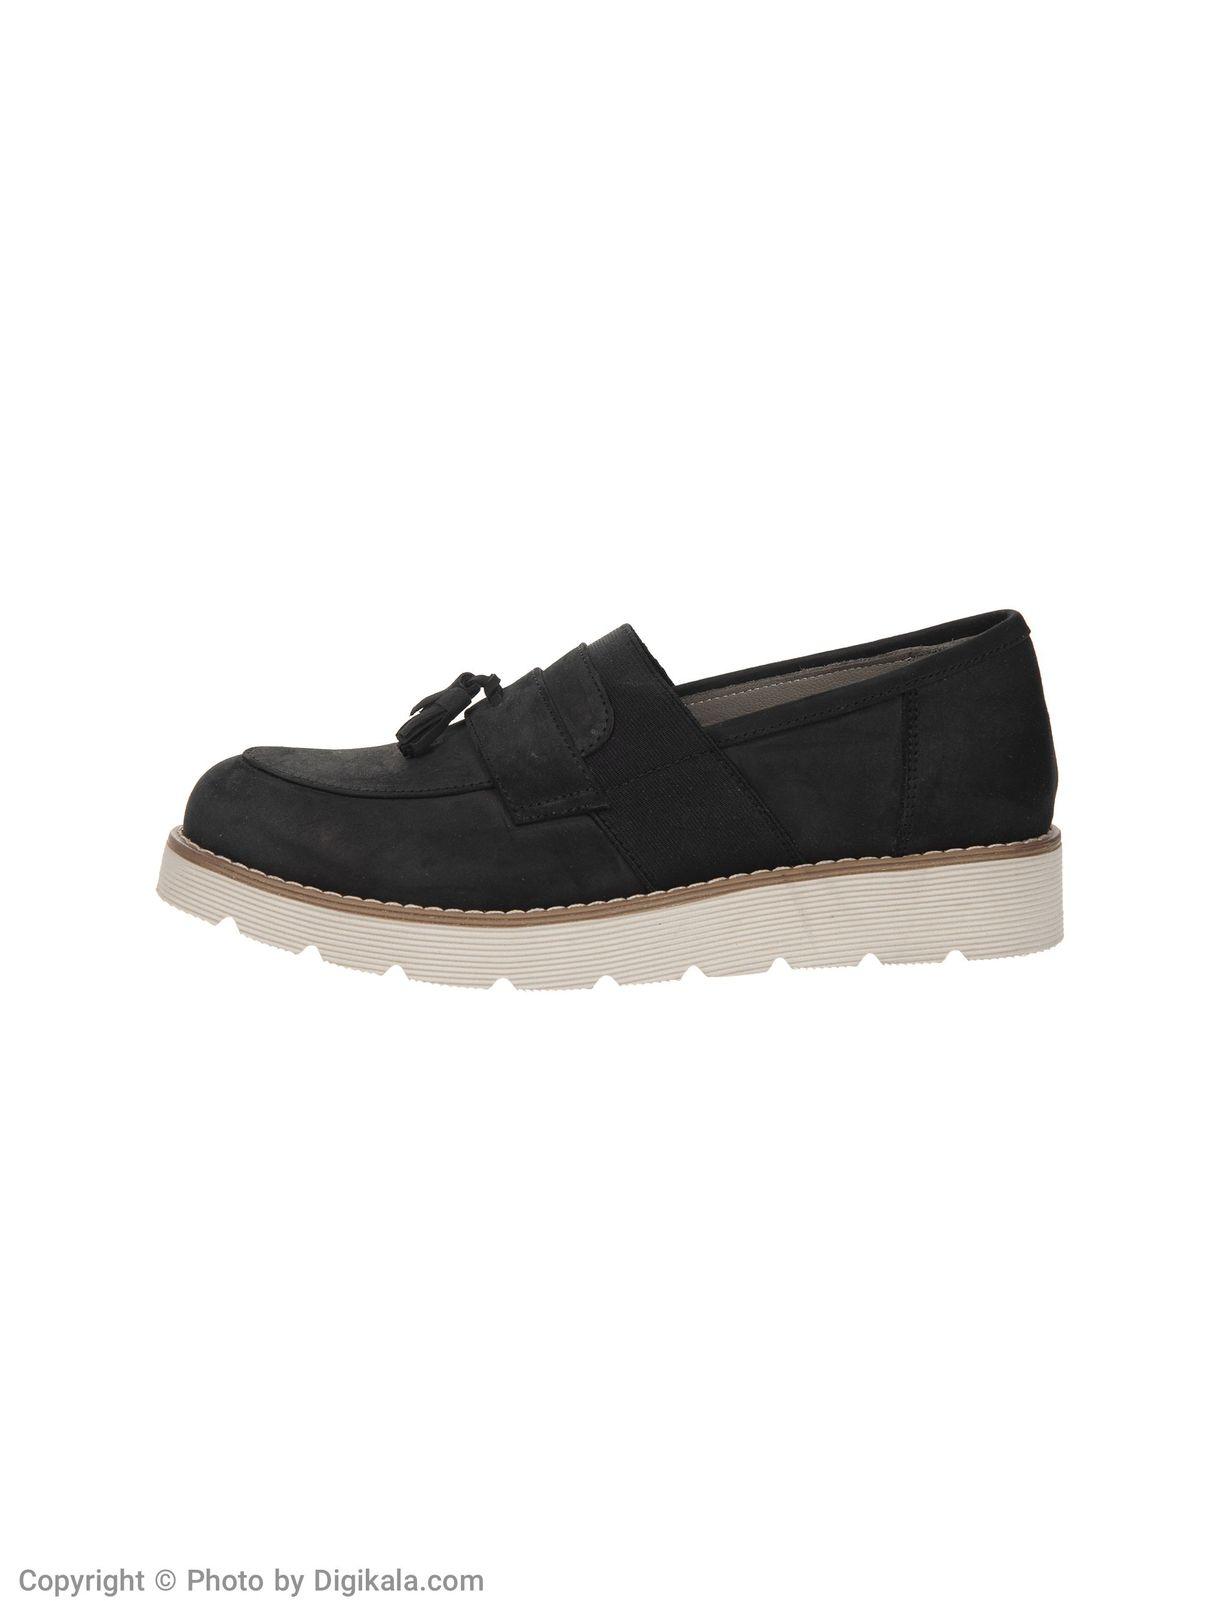 کفش زنانه پانیسا مدل 705-02  Panisa 705-02 Shoes For Women